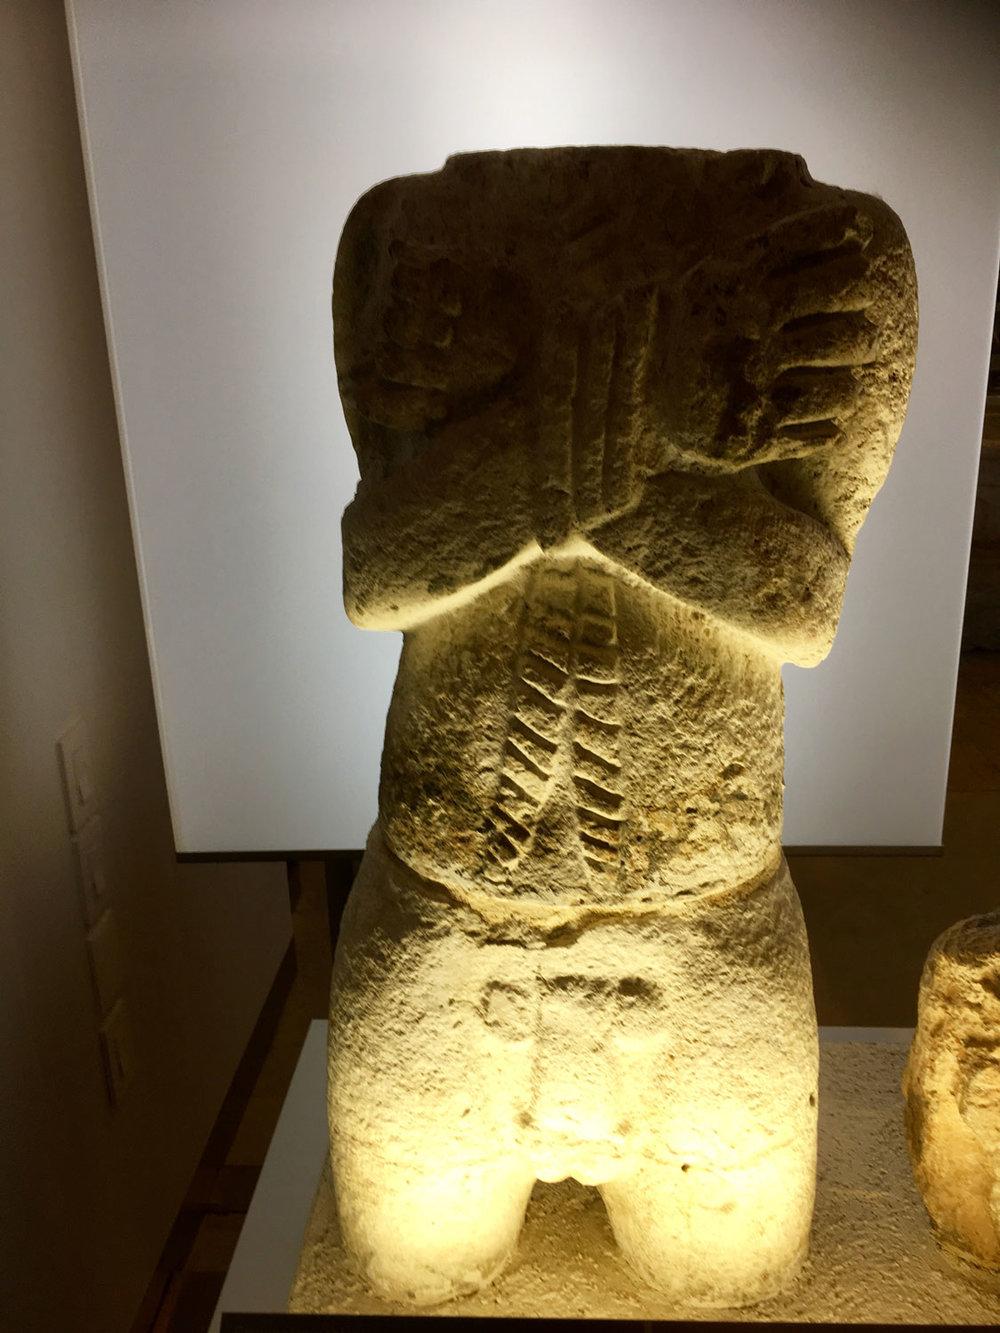 The naked figure (600-900 AD). A war captive.